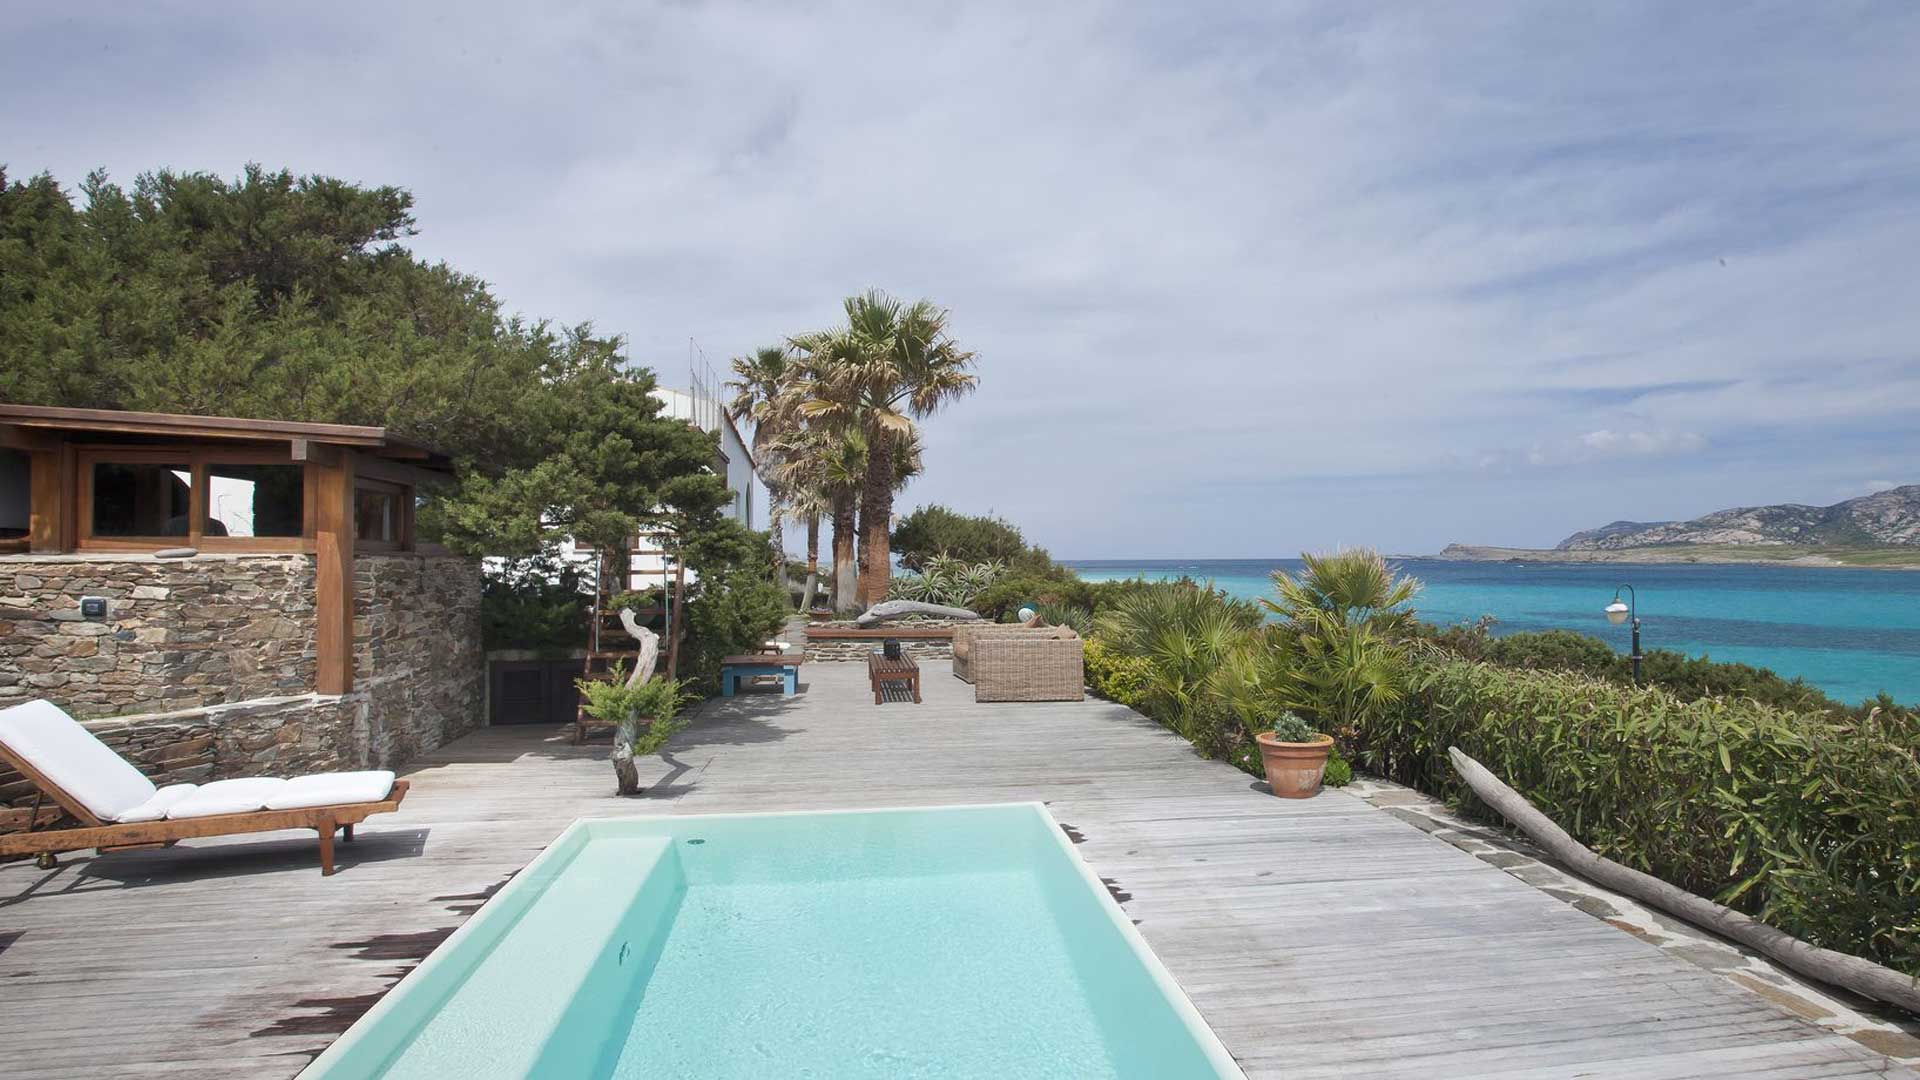 villa giulia villa mieten in sardinien sardinien norden. Black Bedroom Furniture Sets. Home Design Ideas